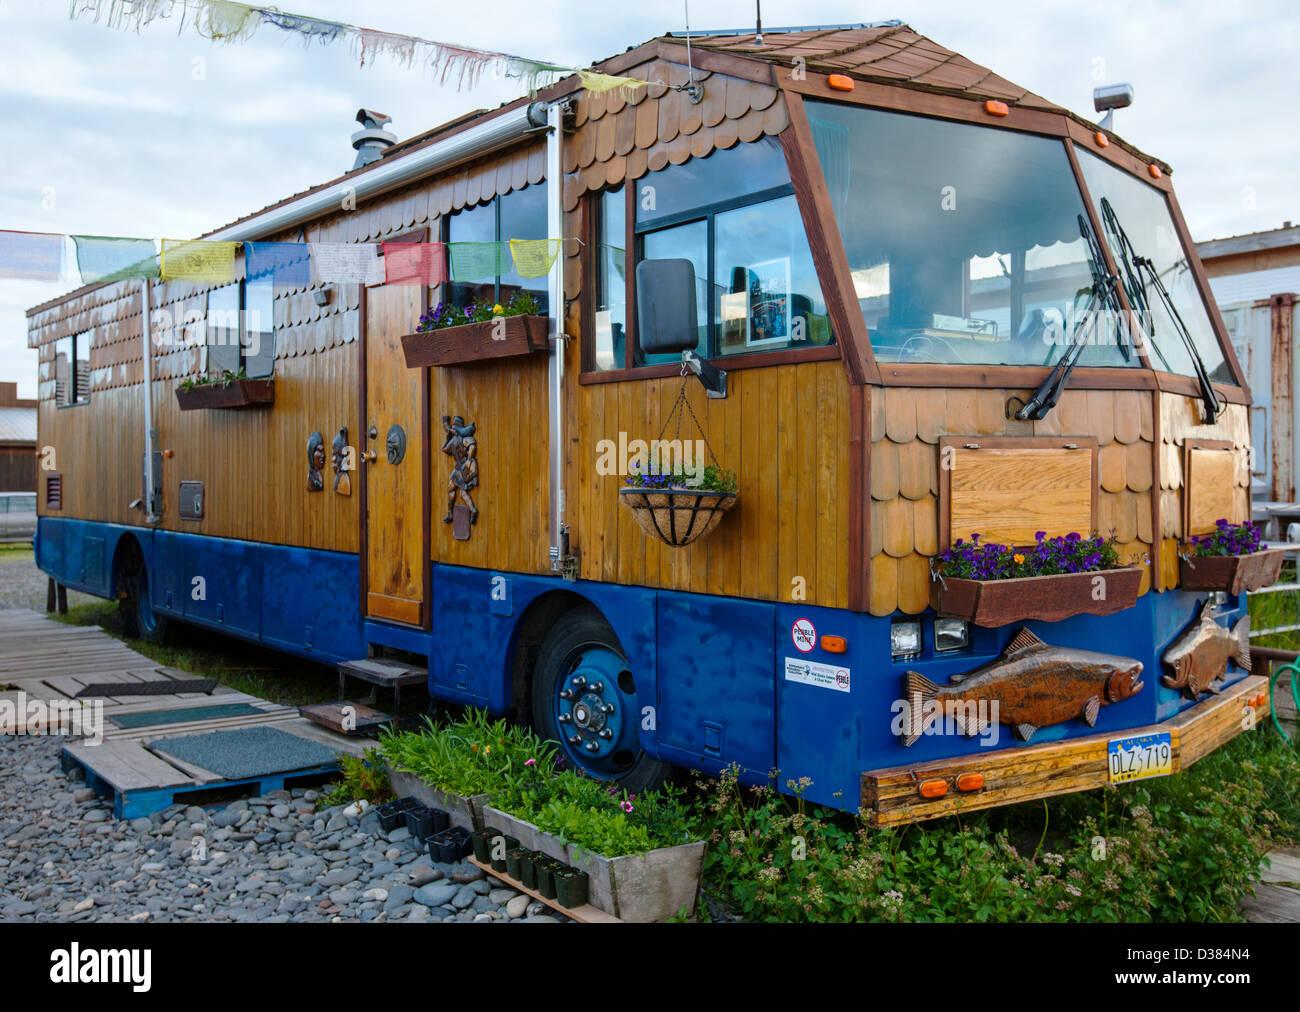 Residente de Homer Spit vive en un vehículo recreativo, personalizada Homer, Alaska, EE.UU. Imagen De Stock